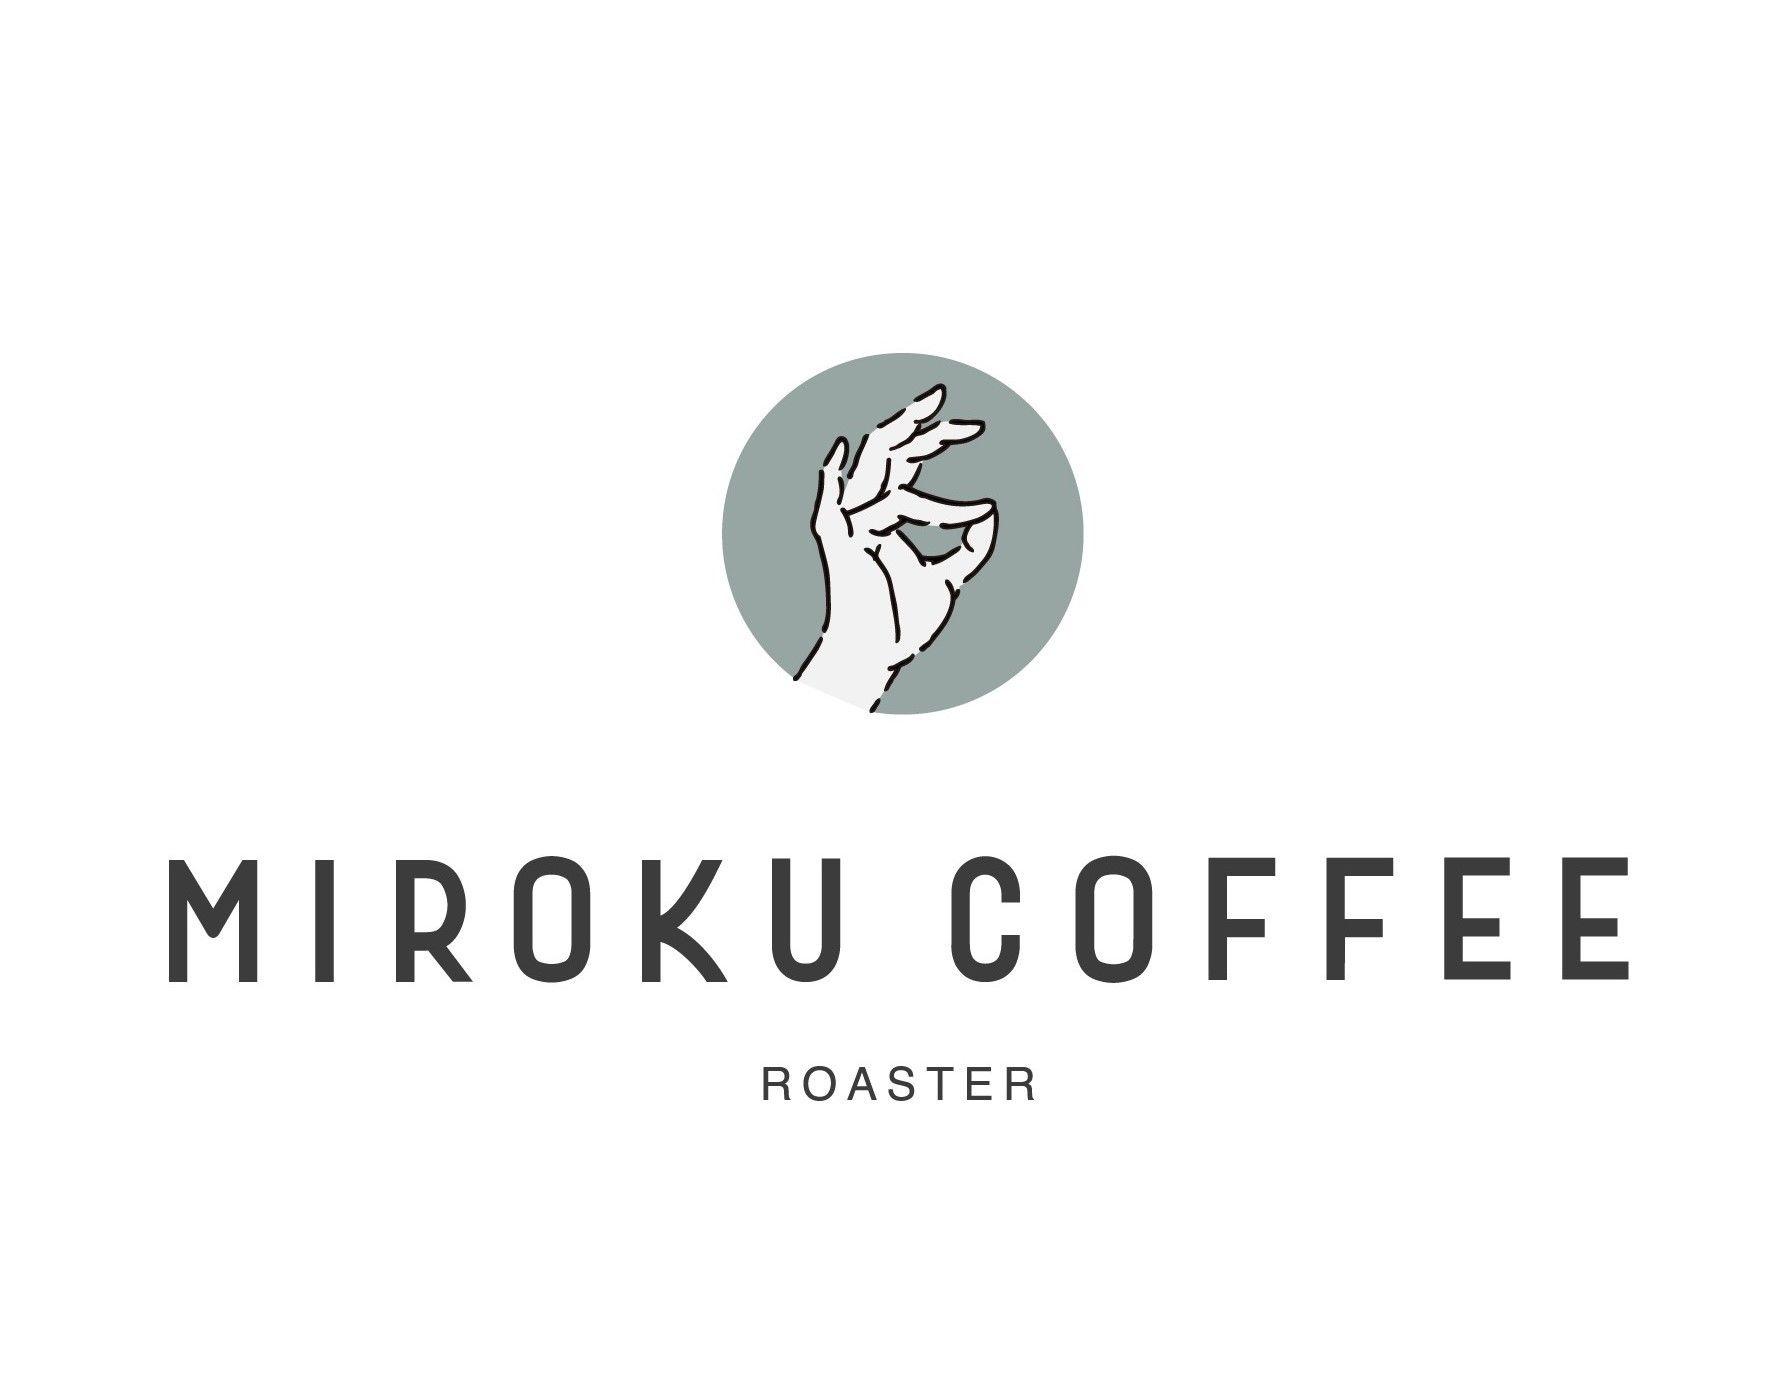 MIROKU COFFEE